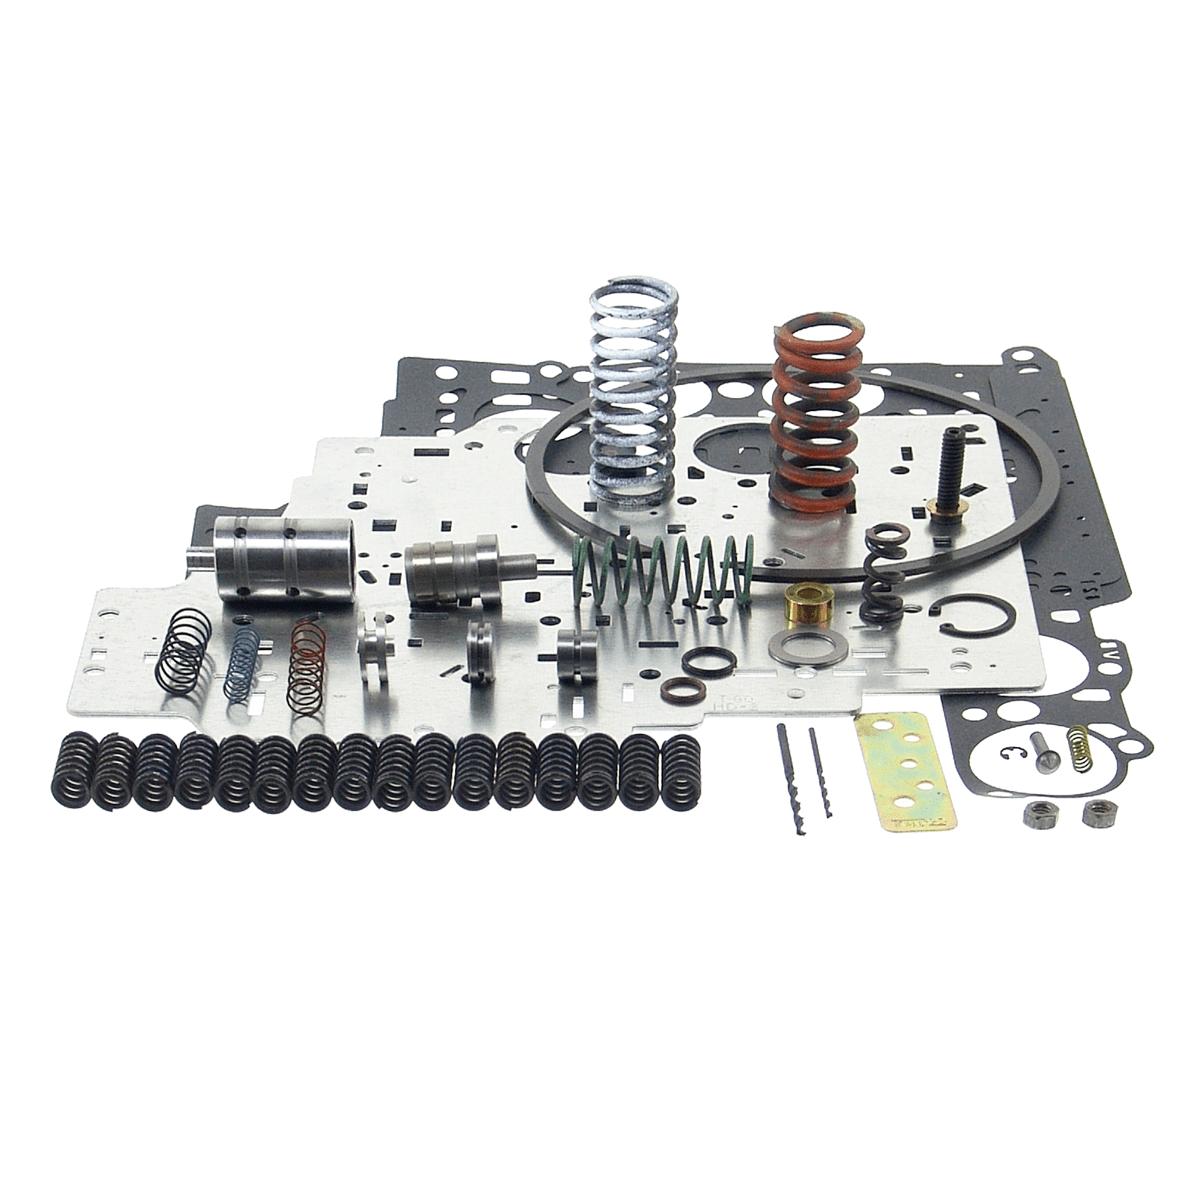 4l80 reprogramming kit